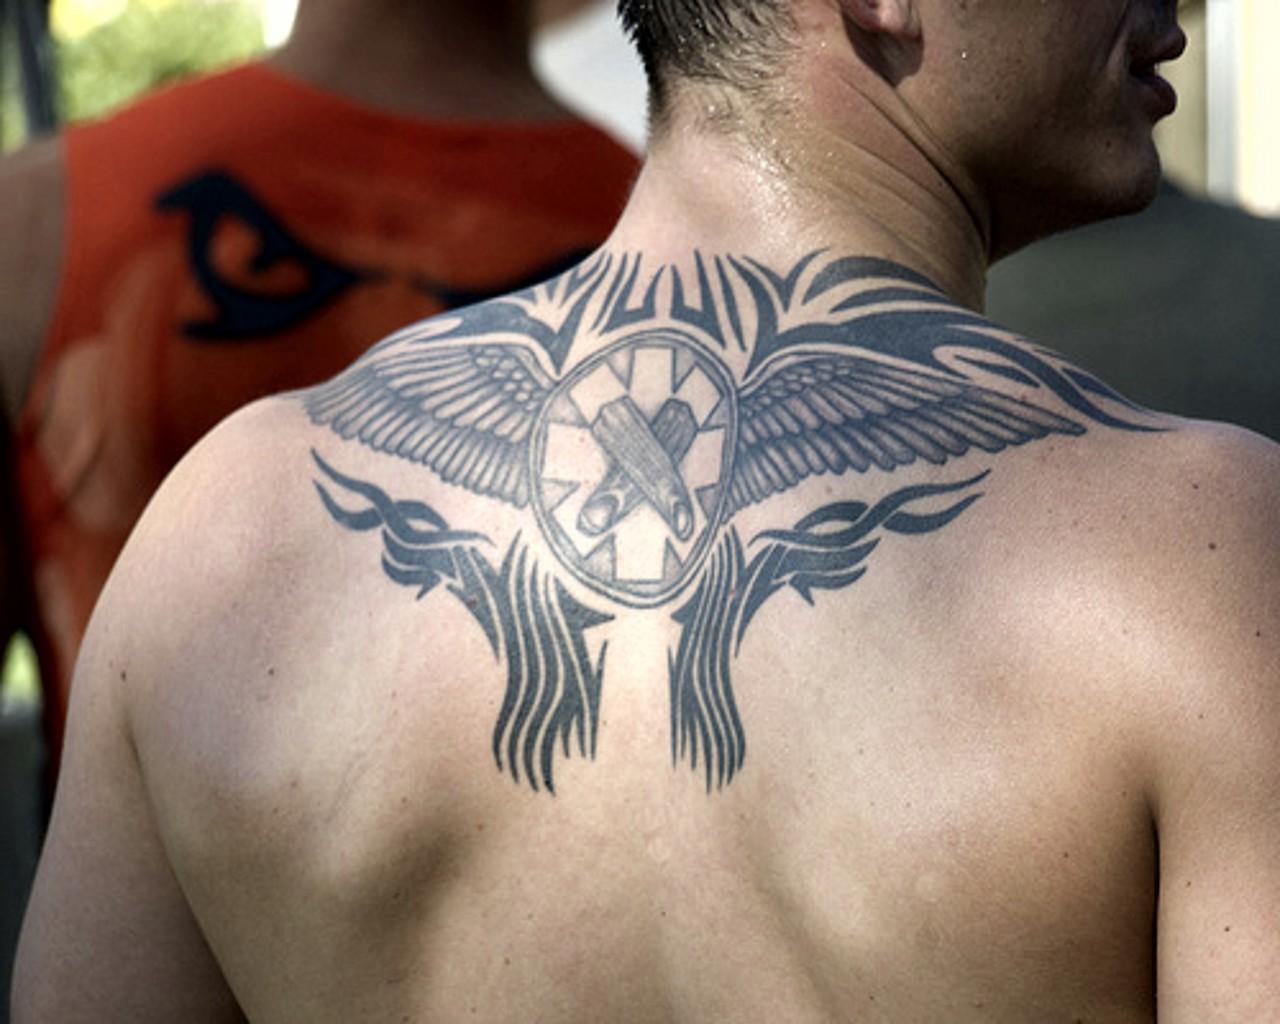 100 best tattoo designs for men in 2015 - 100 Best Tattoo Designs For Men In 2015 619x702 100